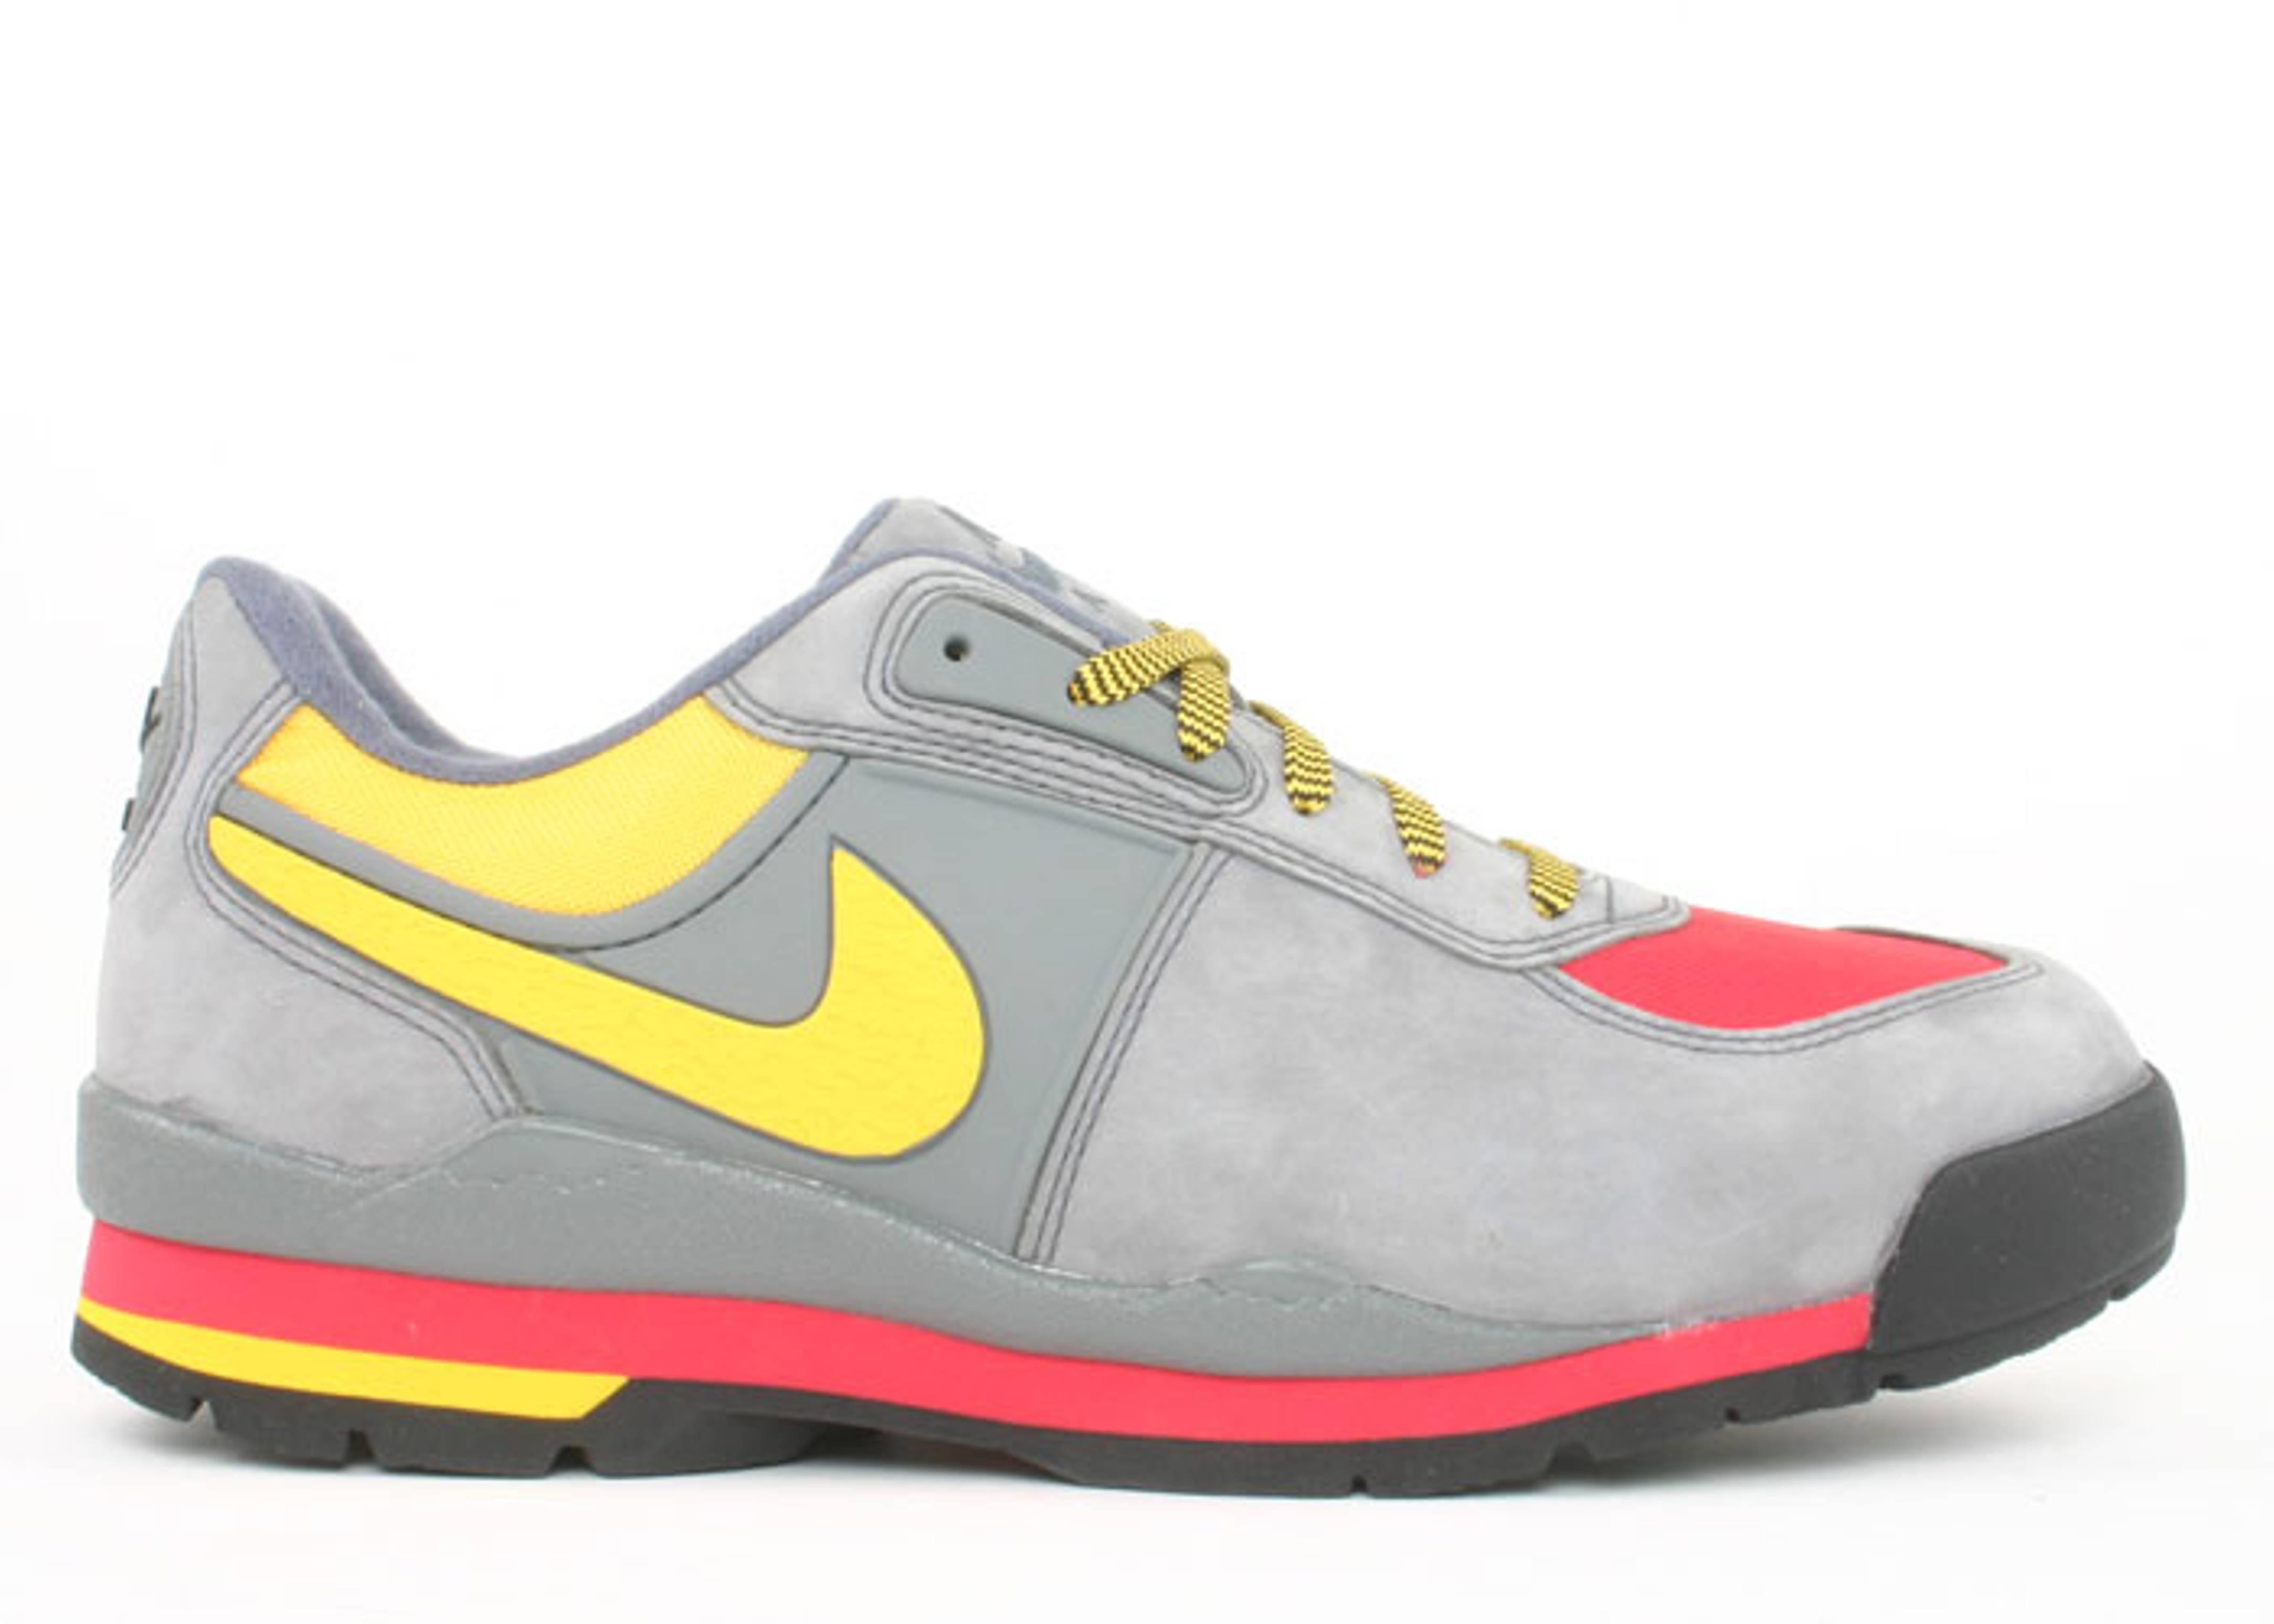 uk availability 7ee84 69a28 Air Baltoro Low - Nike - 312431 071 - flint greyvarsity maize  Flight Club